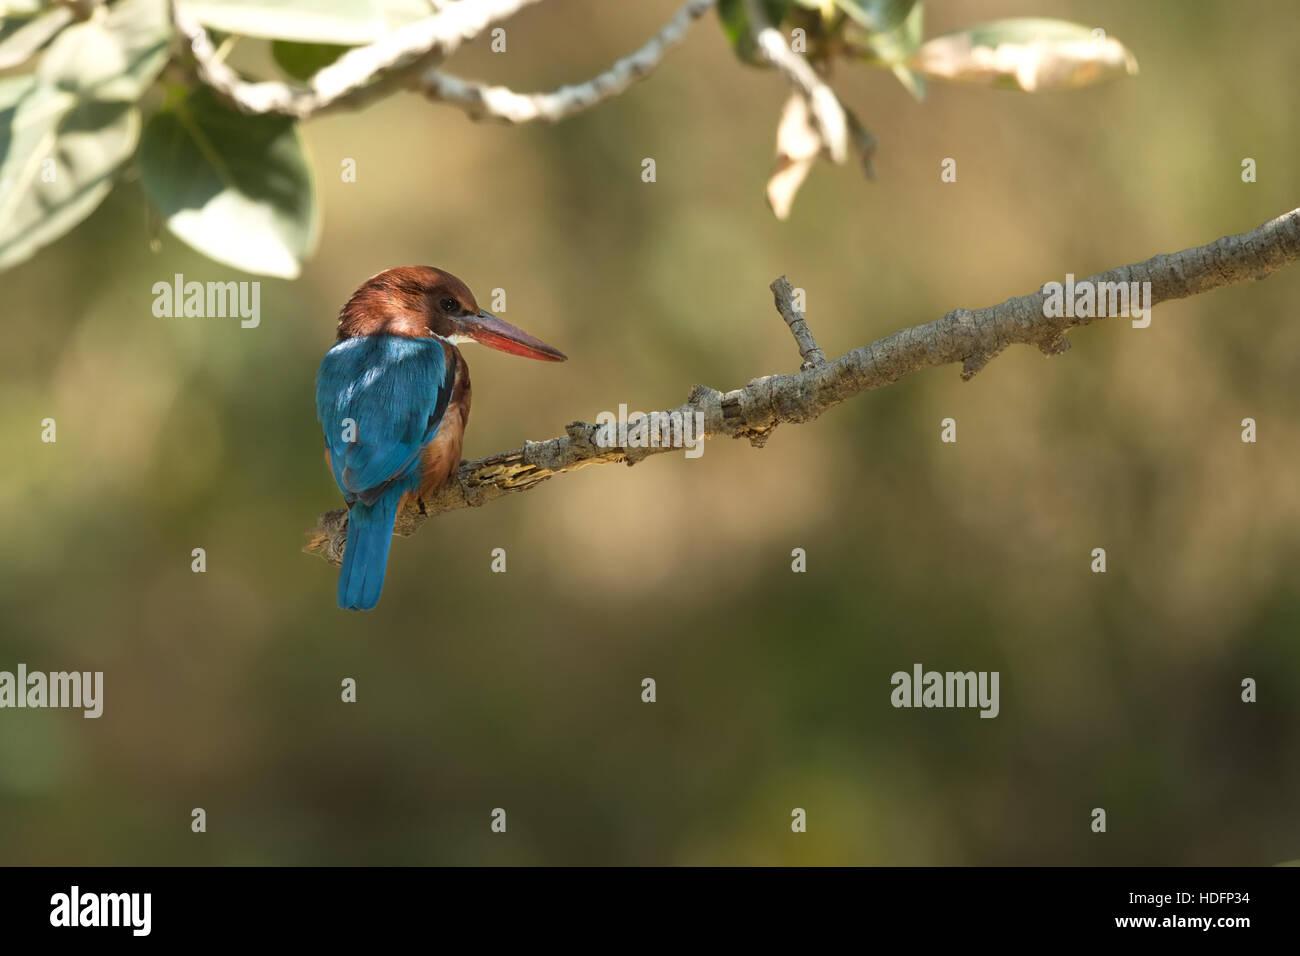 Beautiful bird, White-throated Kingfisher (Halcyon smyrnensis) on the stump, bird of Thailand. - Stock Image